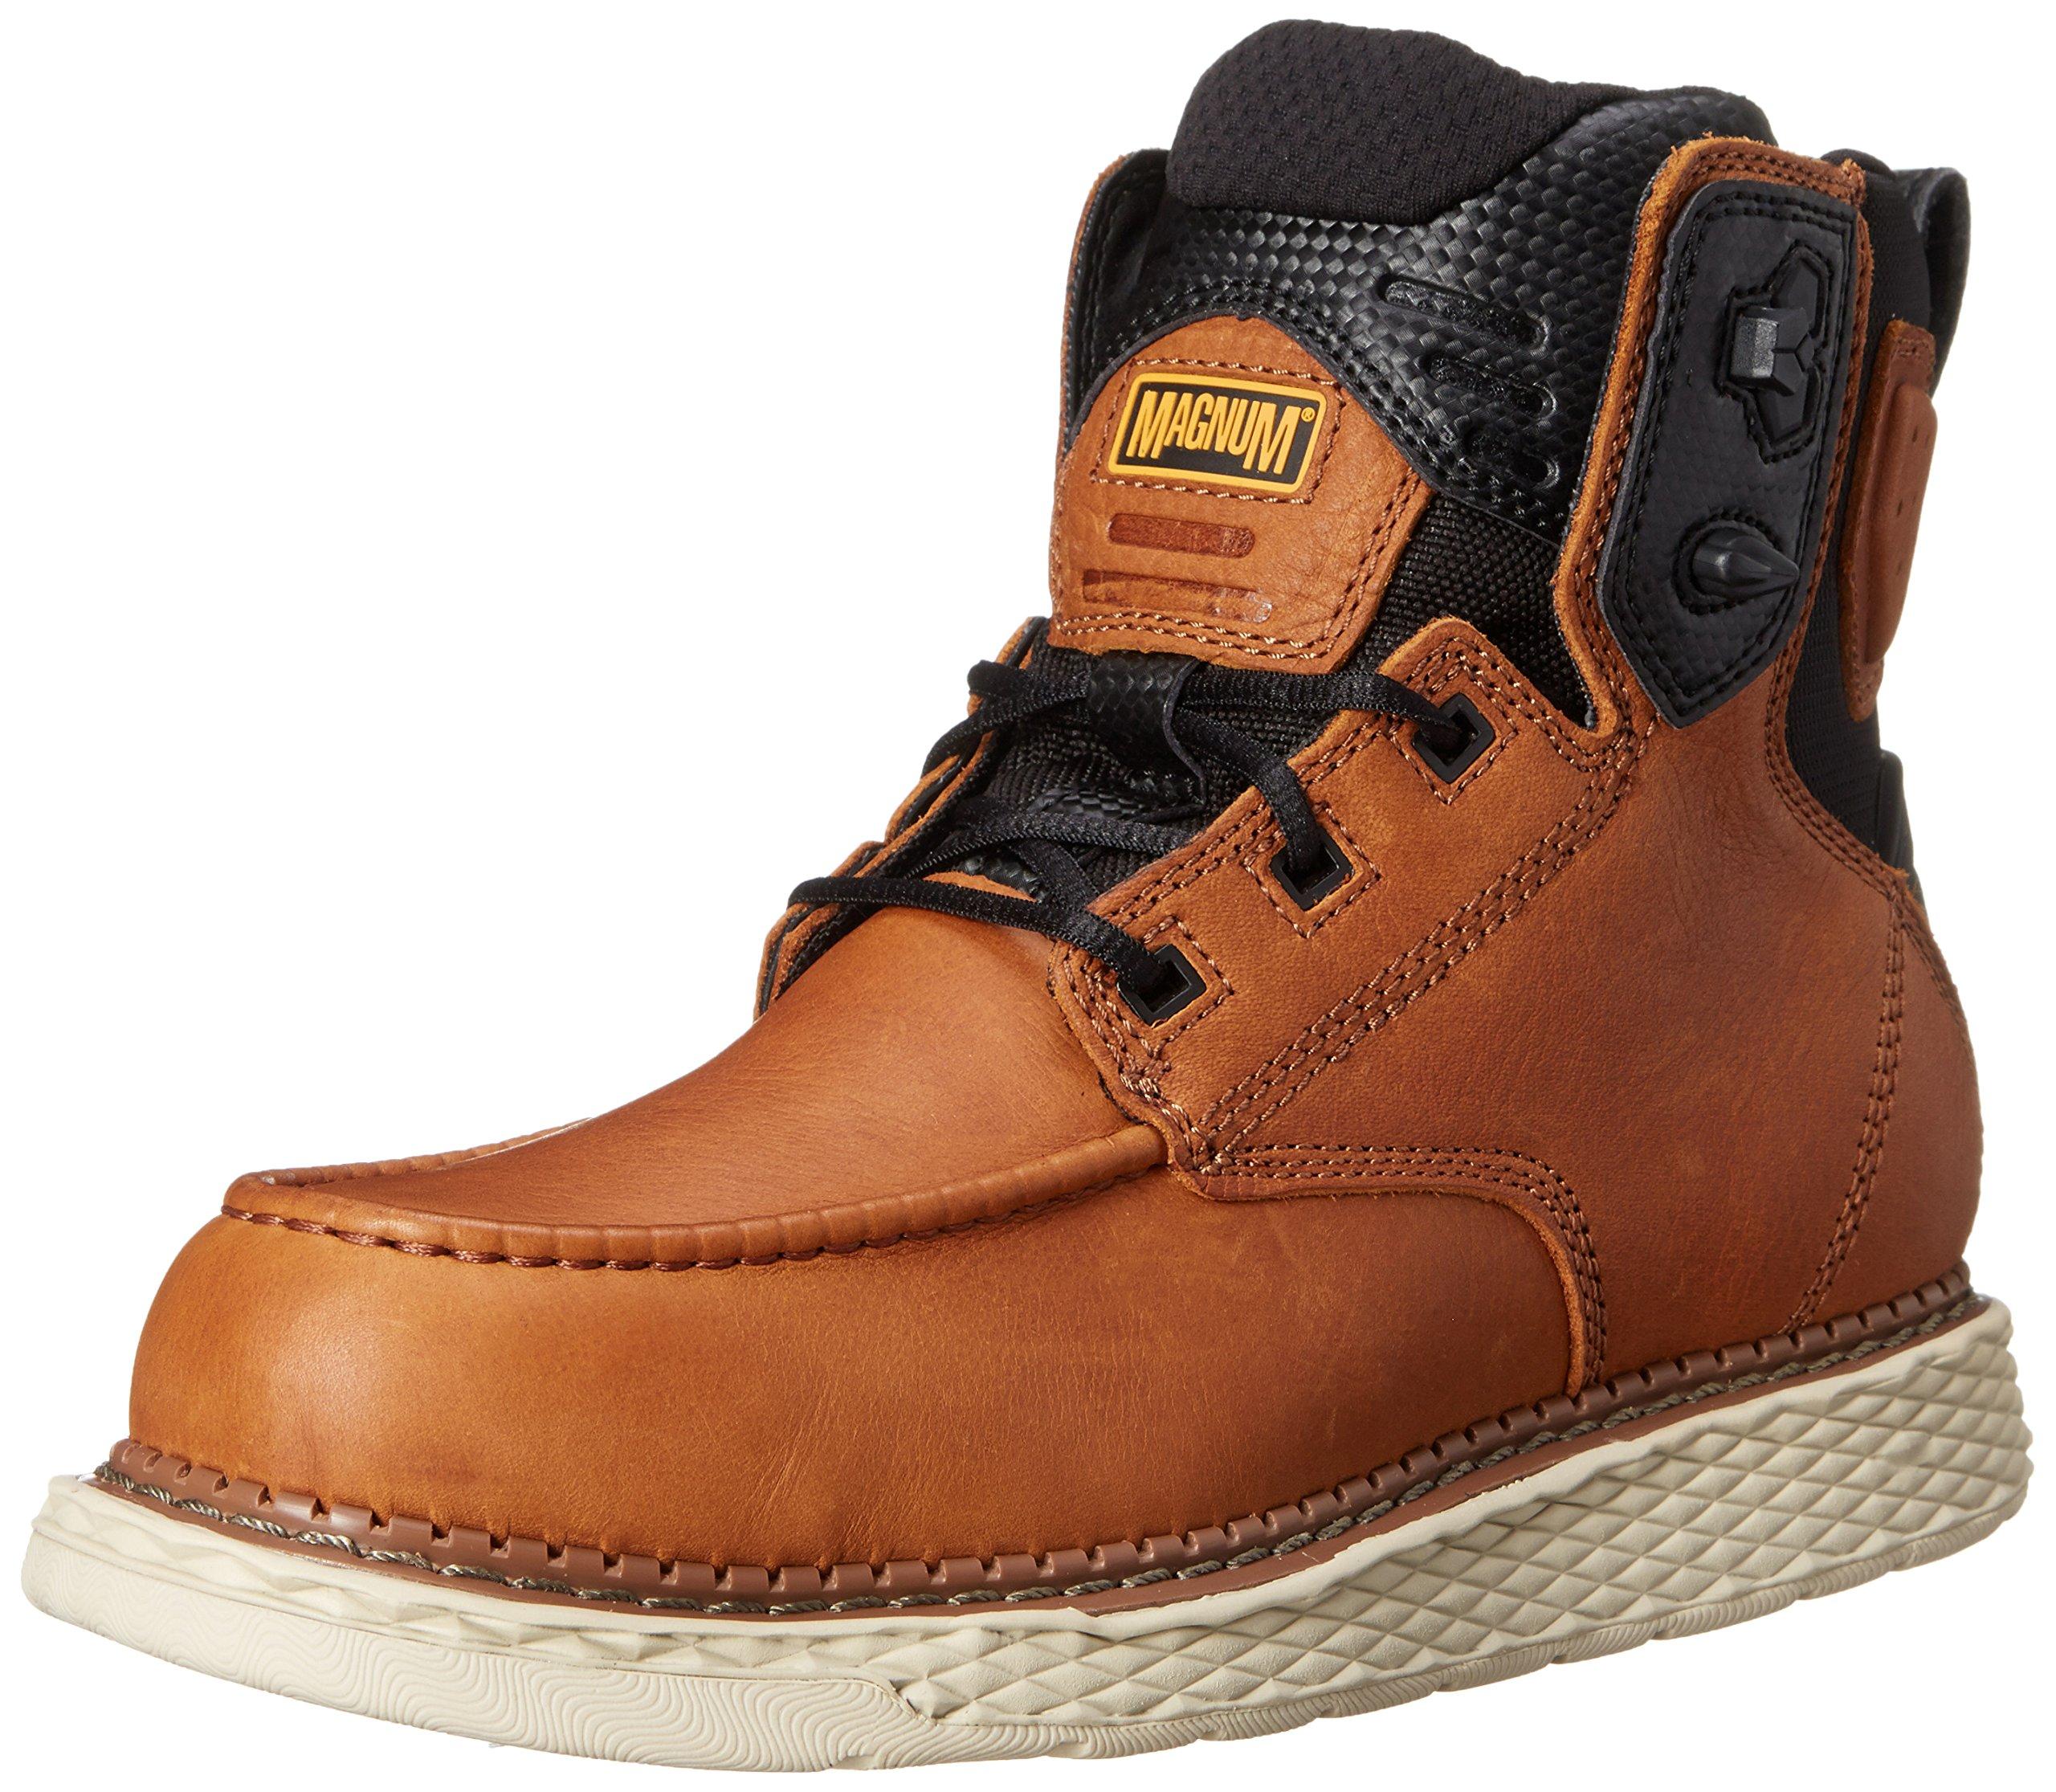 Magnum Men's Stockton 6.0 Workboot Work Shoe, Tan, 12 M US